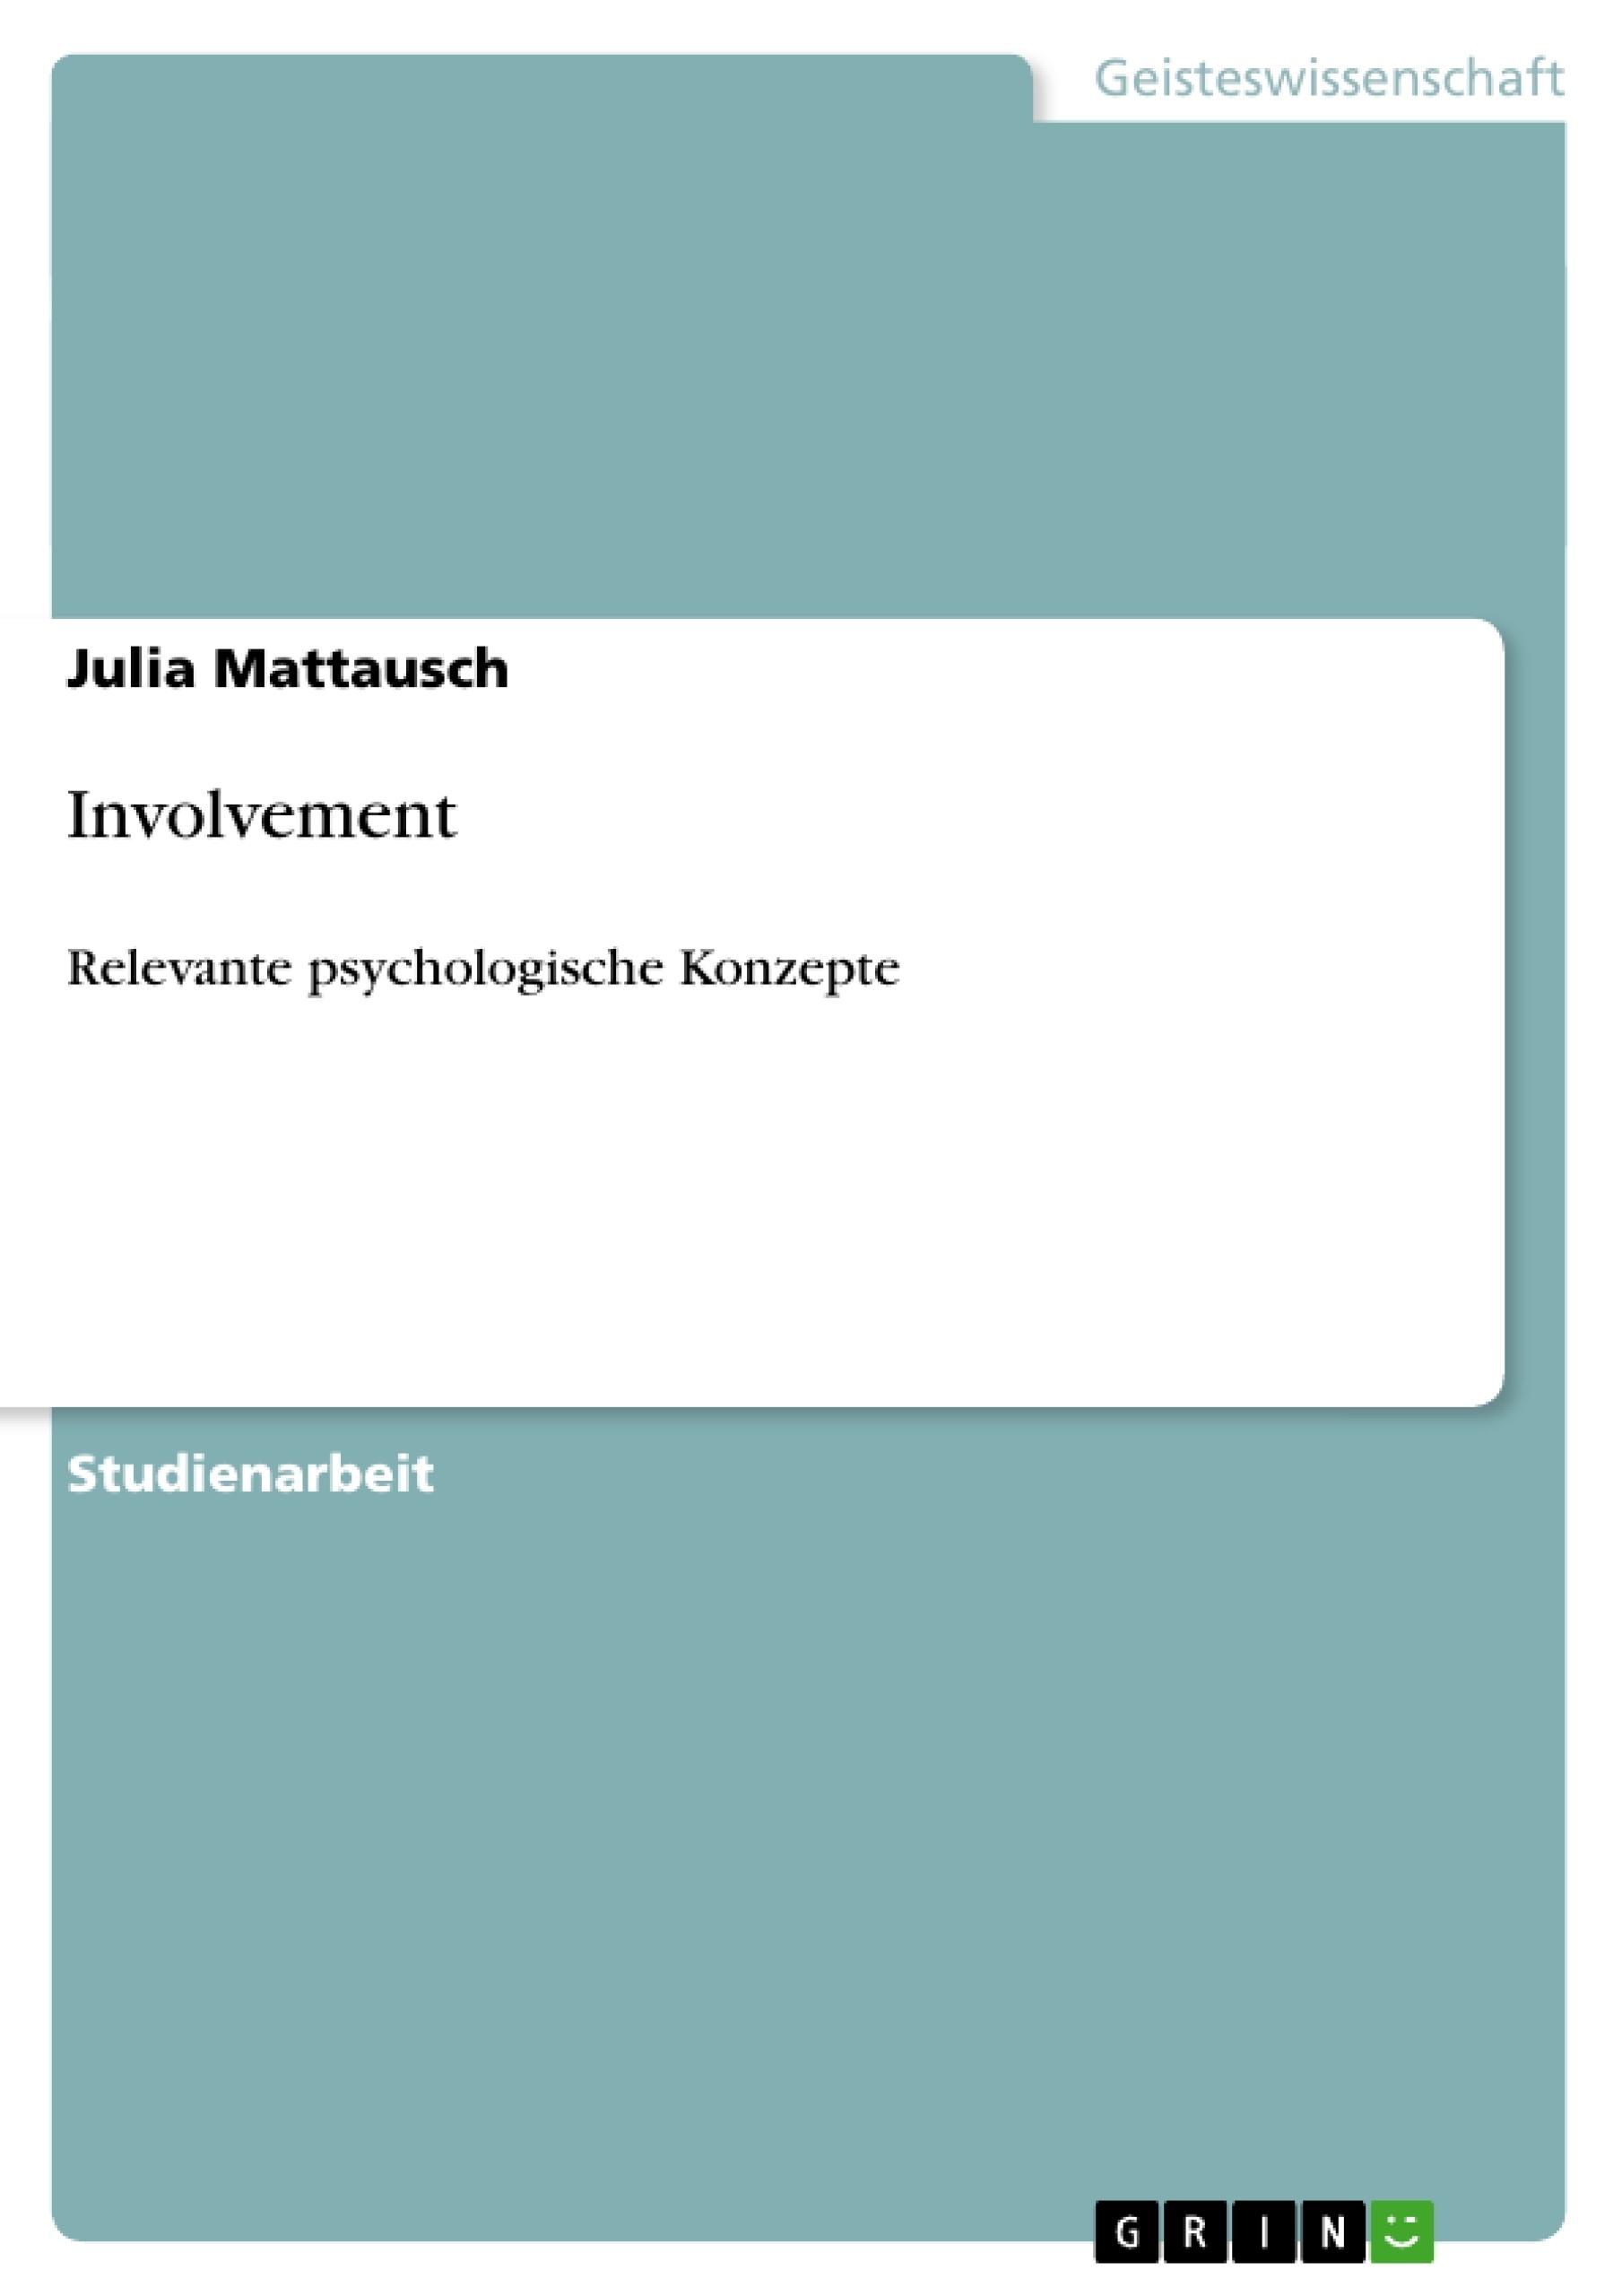 Titel: Involvement. Relevante psychologische Konzepte